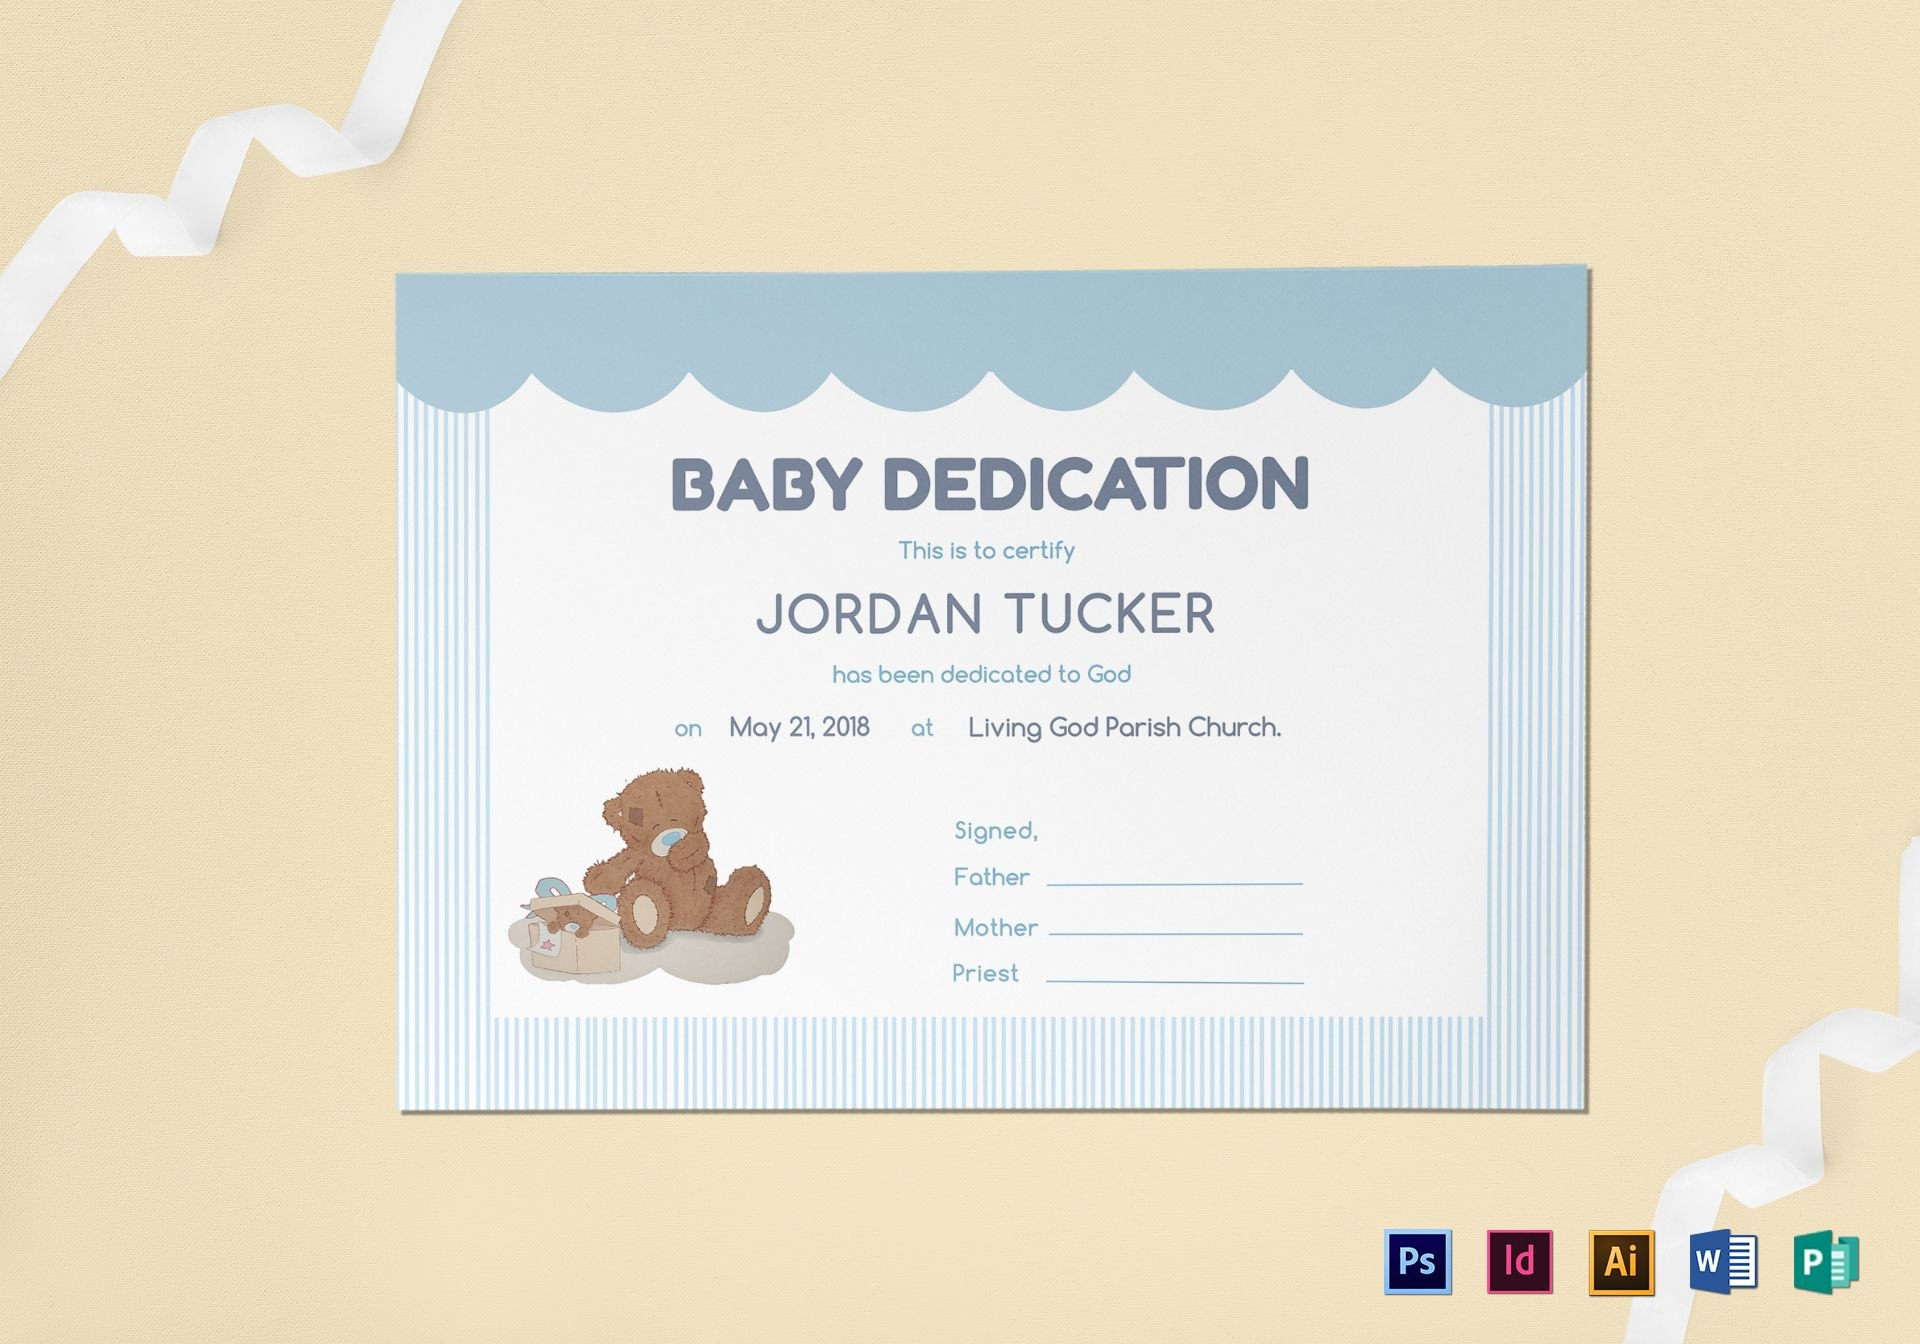 Baby Dedication Certificate Design Template In Psd Word Publisher For Baby Dedication Certificate Template